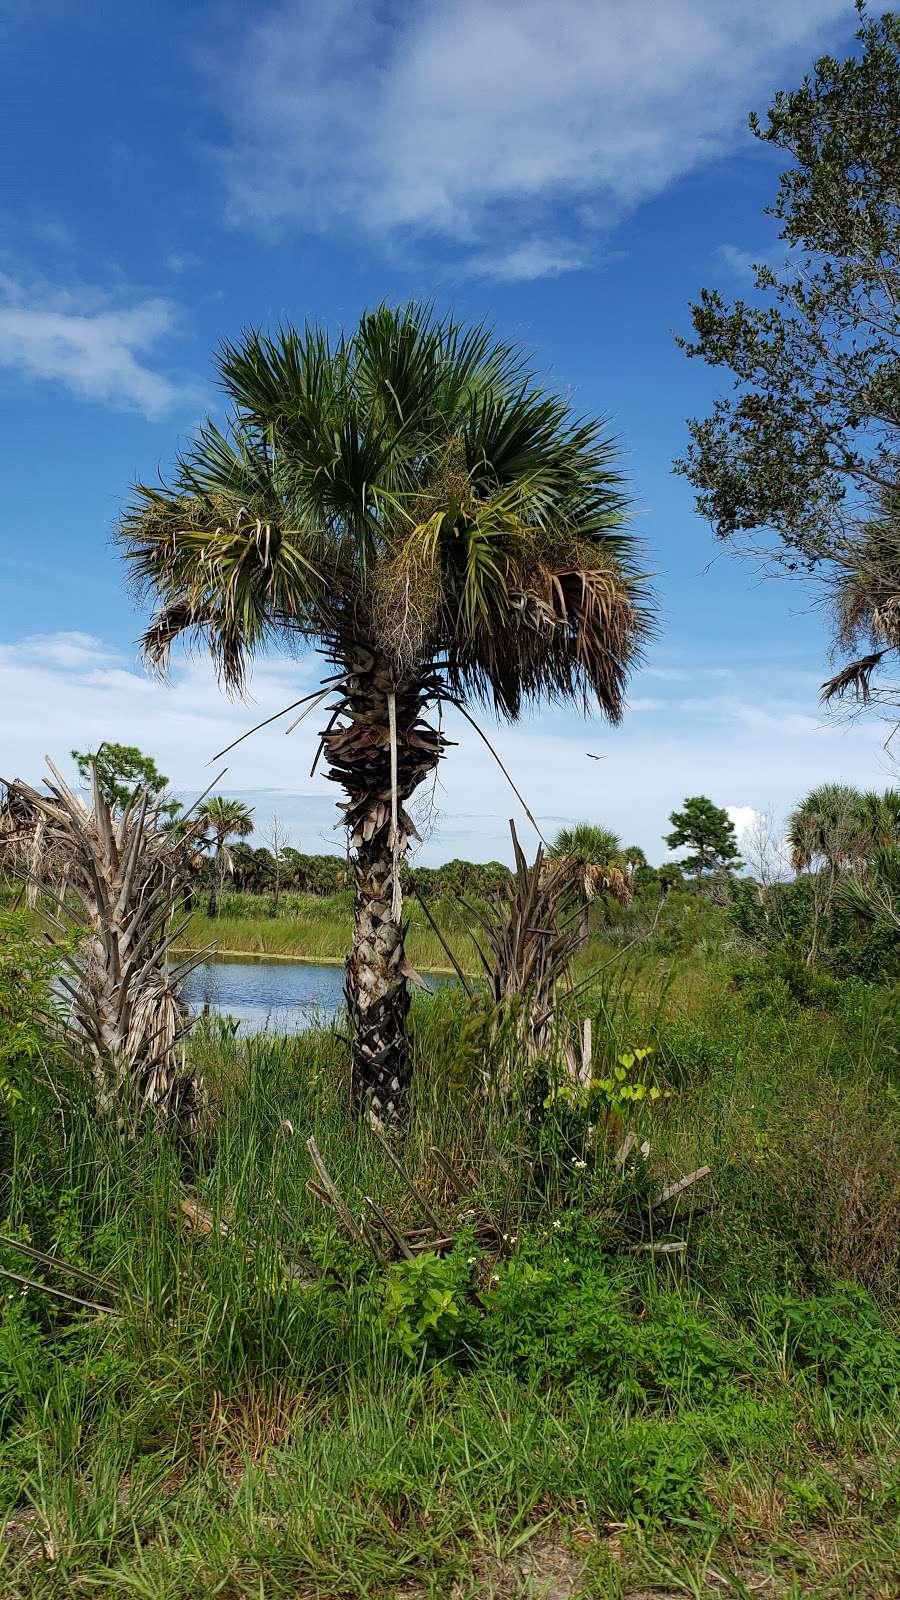 Blackpoint Wildlife Drive Entrance - park  | Photo 4 of 10 | Address: Blackpoint Wildlife Dr, Titusville, FL 32796, USA